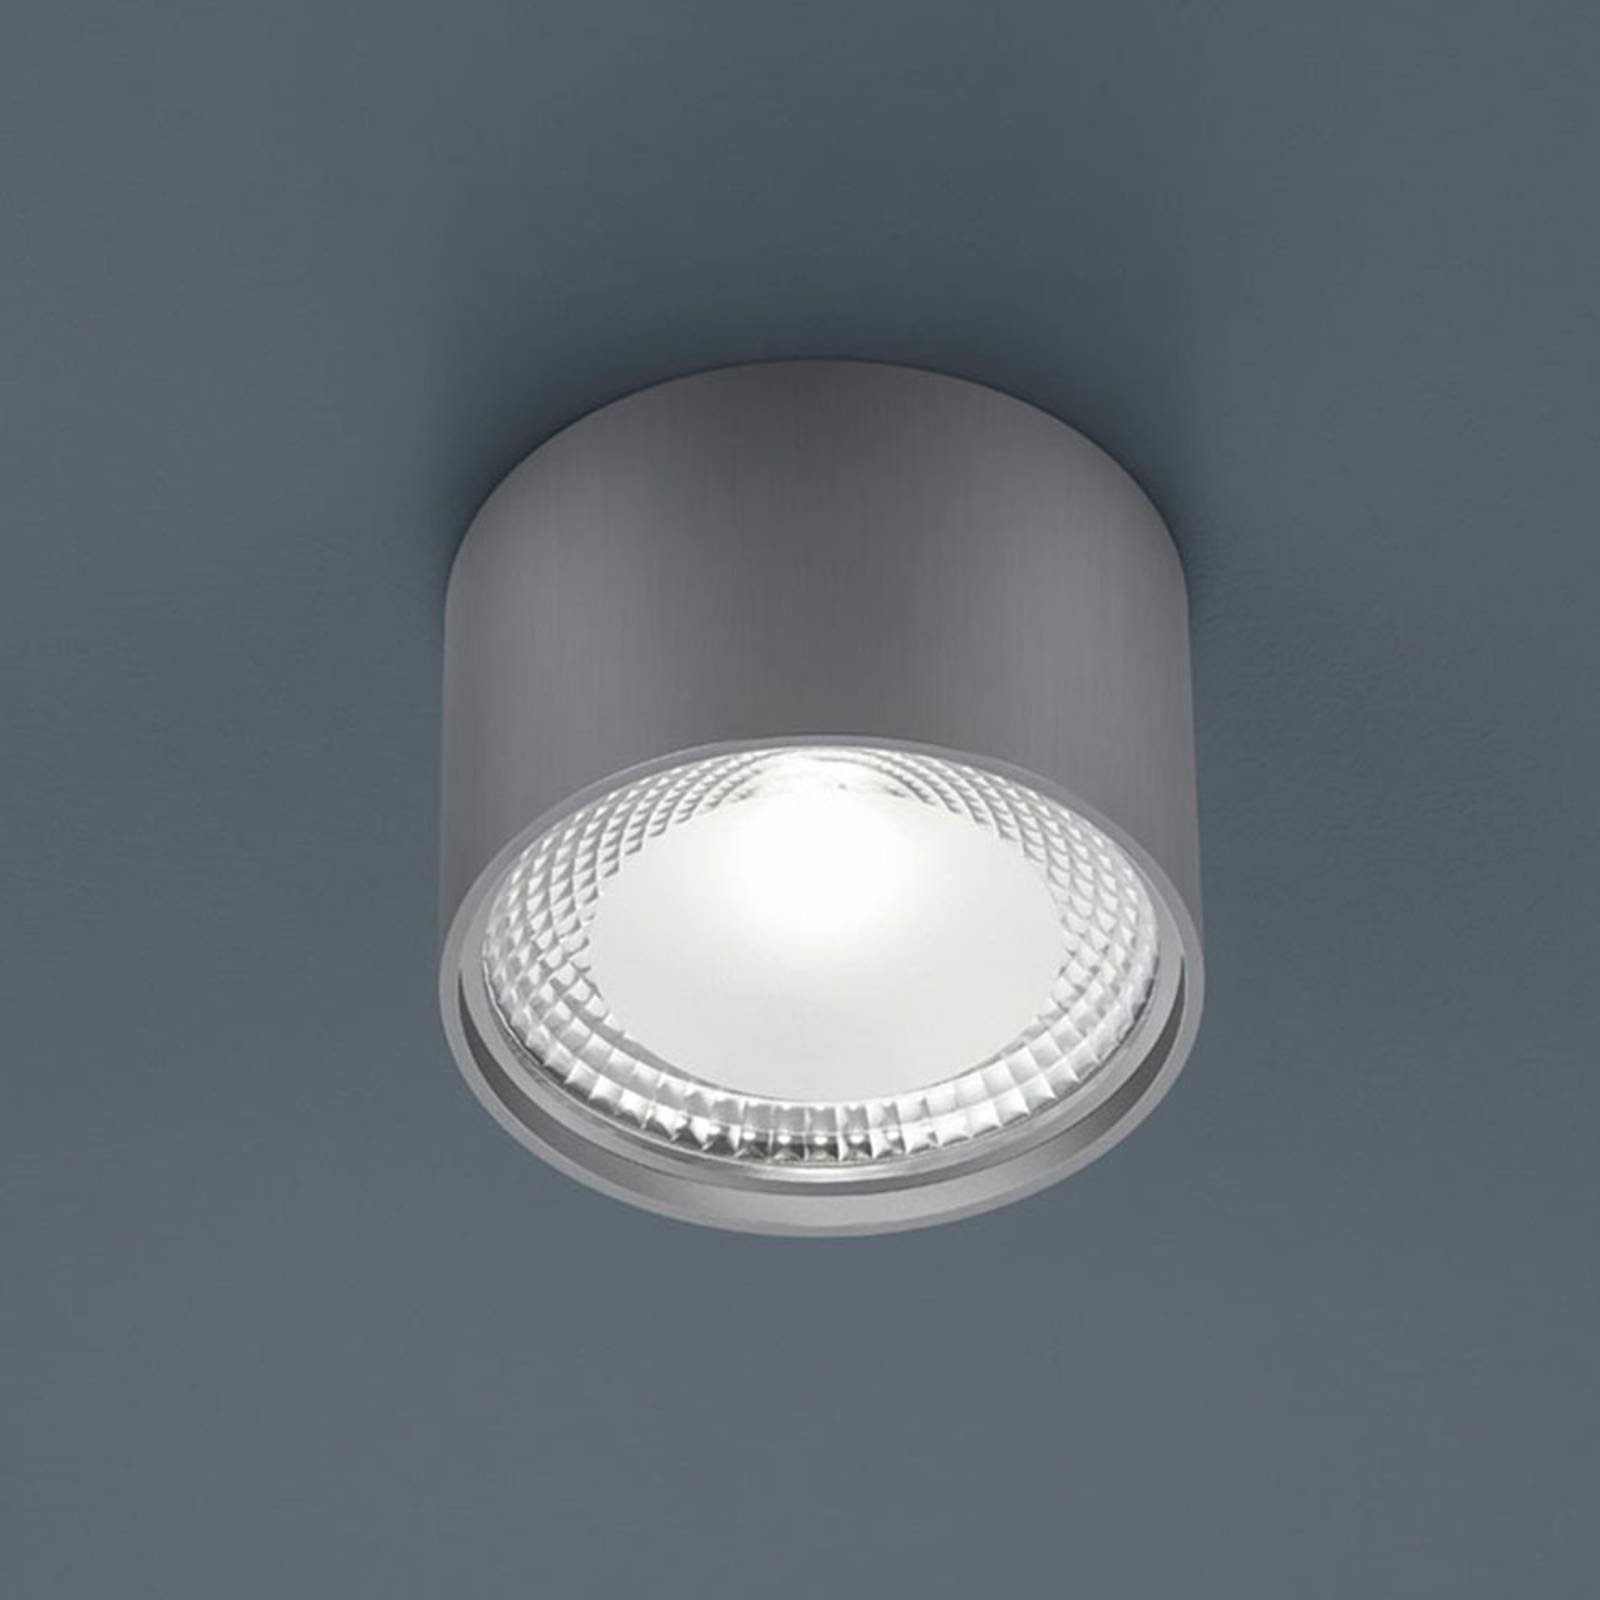 Helestra Kari LED-taklampe, rund, nikkel